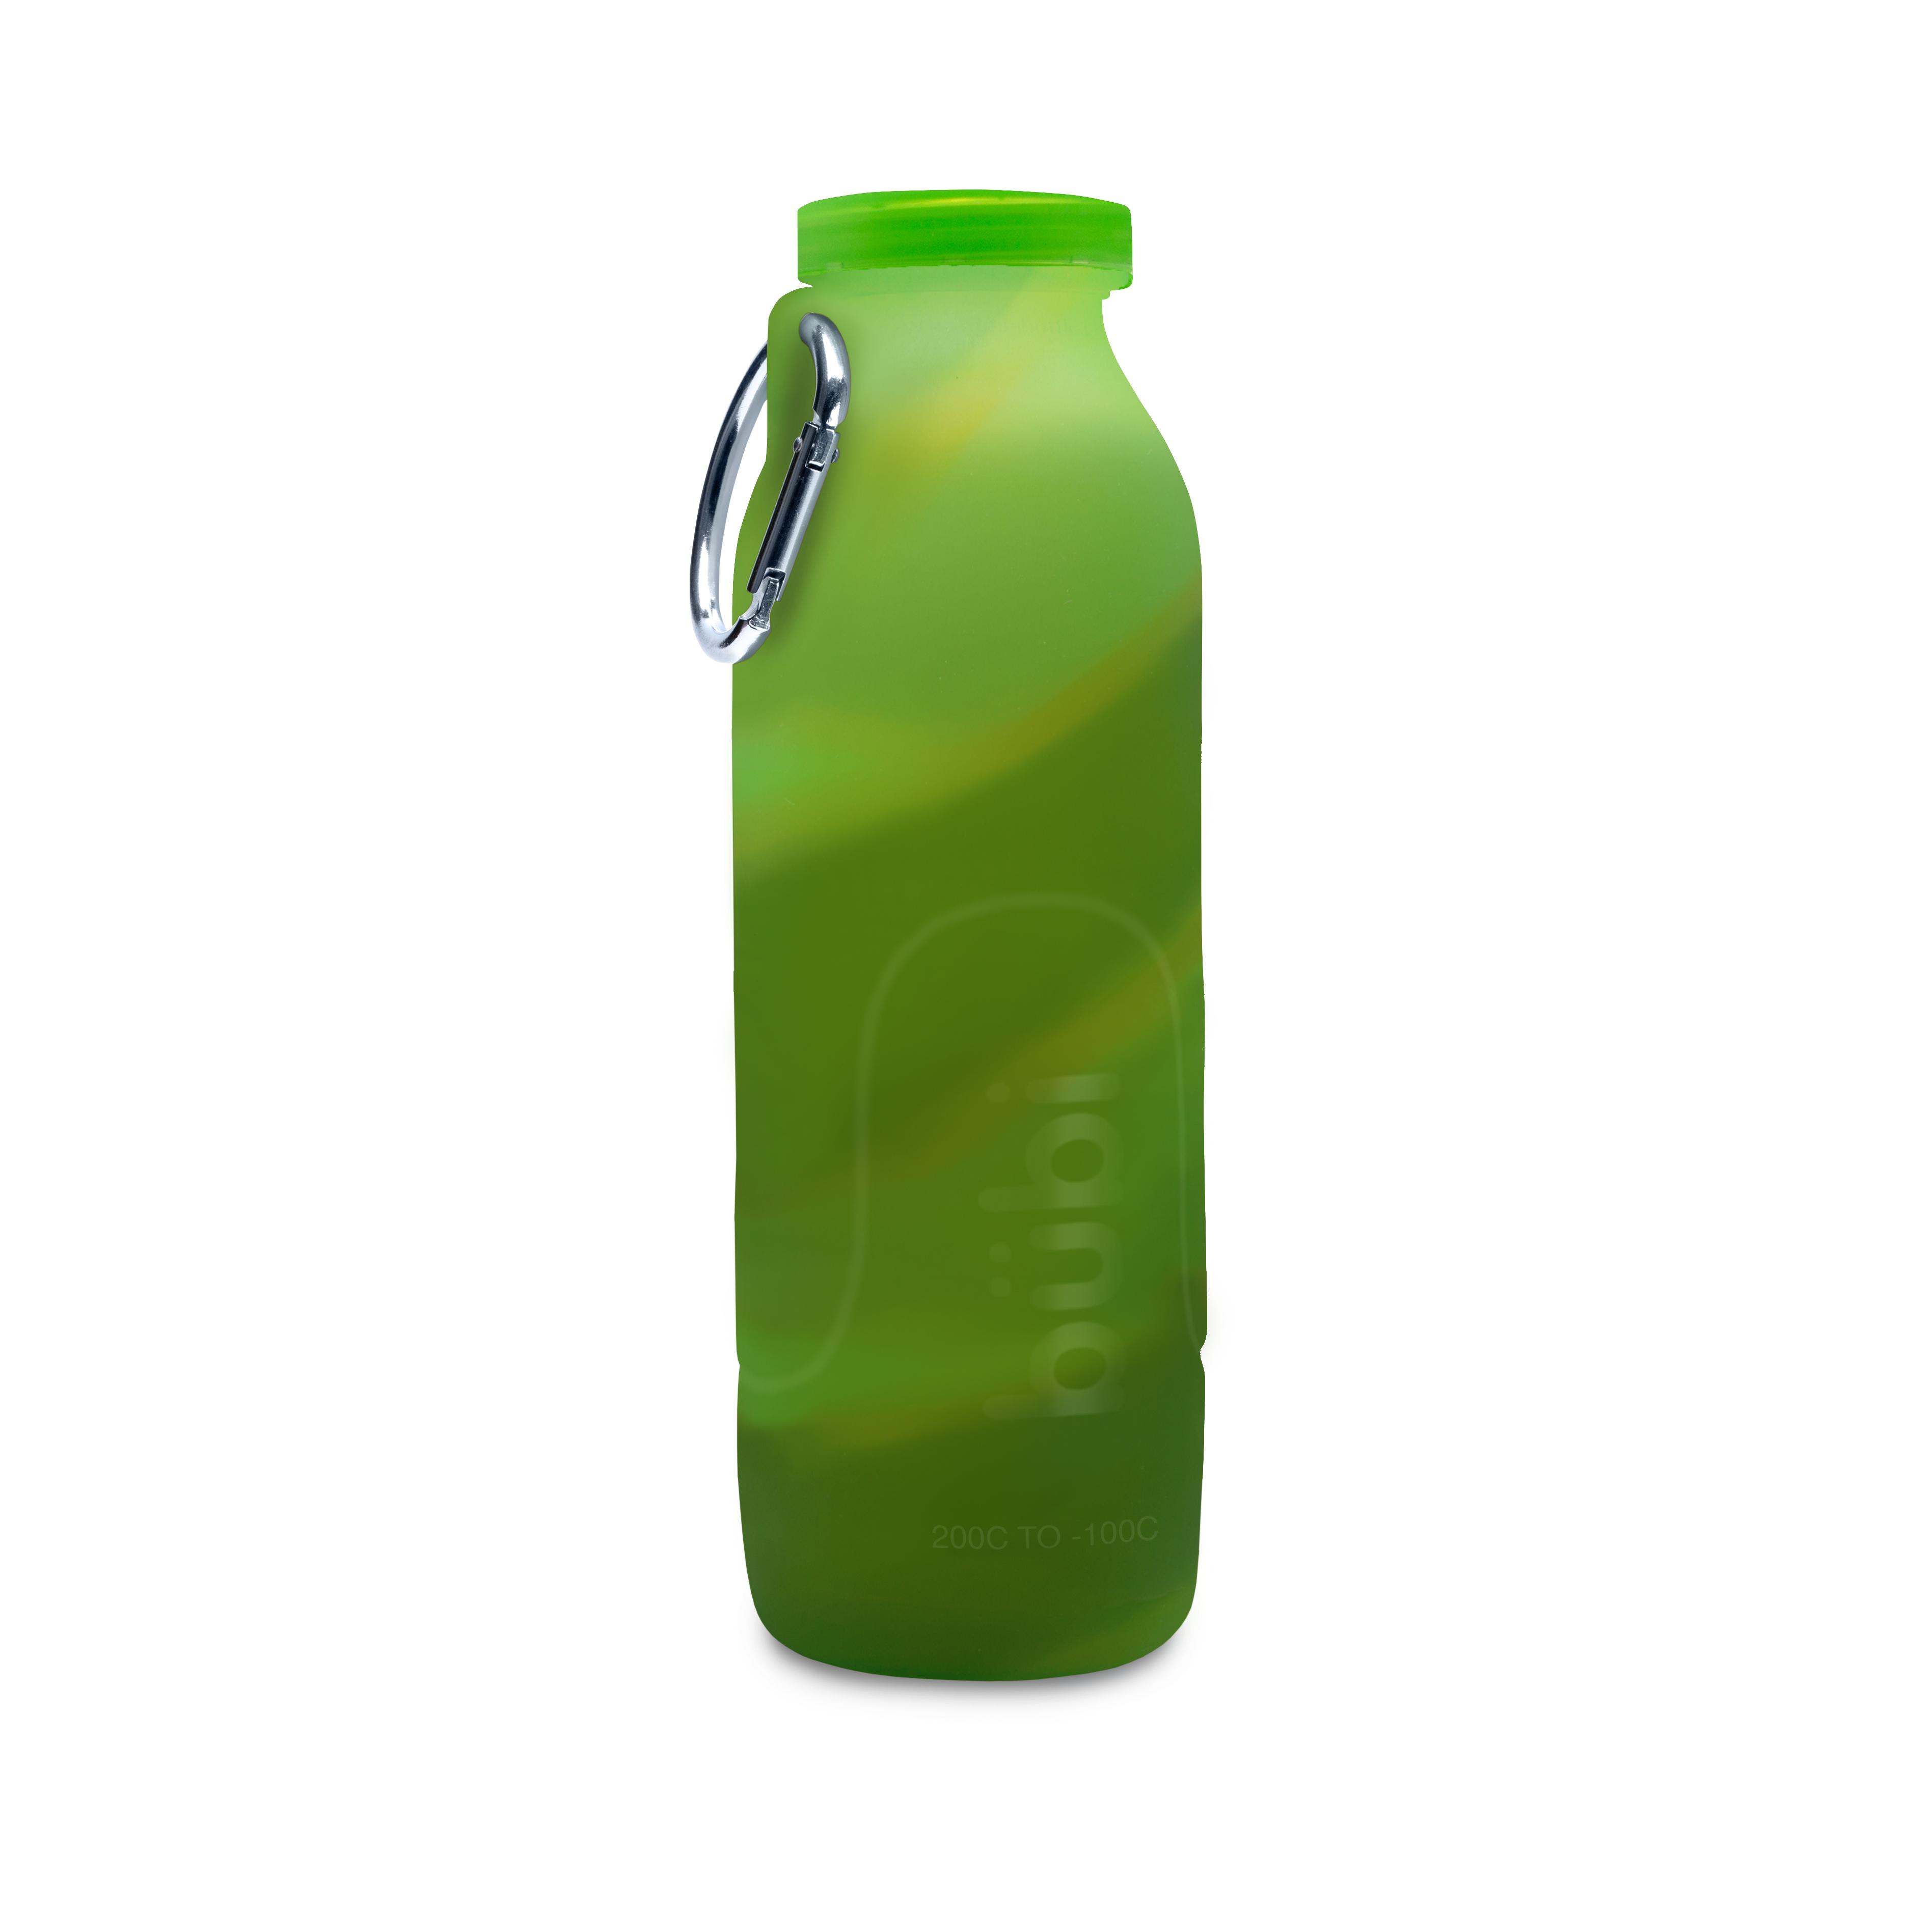 BUBI BOTTLE 矽膠摺疊多功能水壺1000ml-迷彩綠